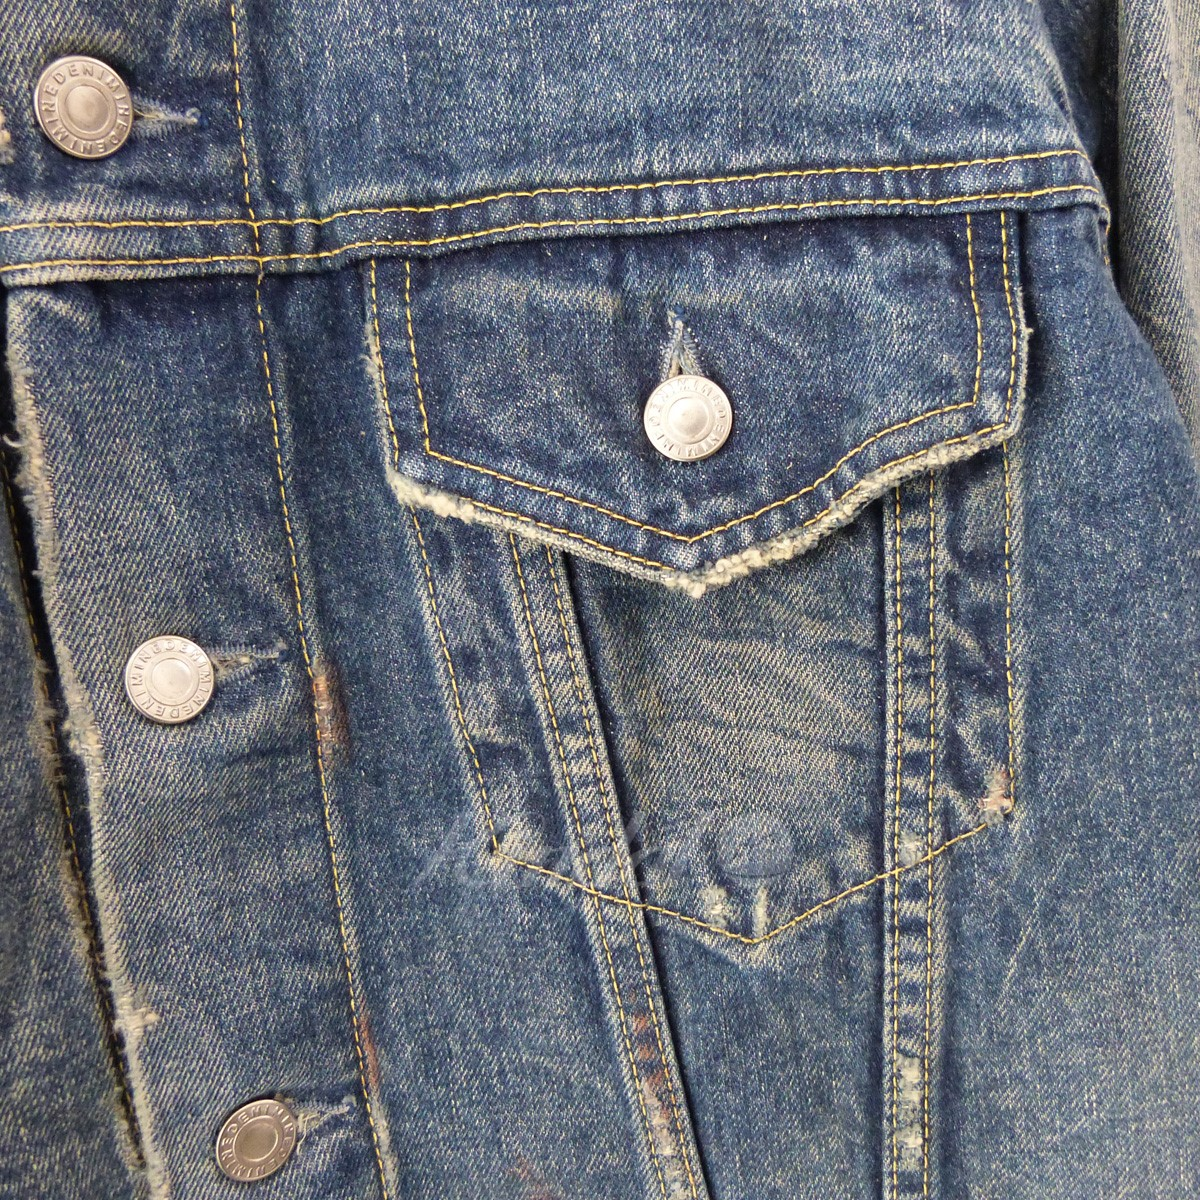 MINEDENIM 18AW 3RD Type Denim JKT 3rdデニムジャケット Gジャン インディゴ サイズ 2280220マインデニム2DeYbHIW9E